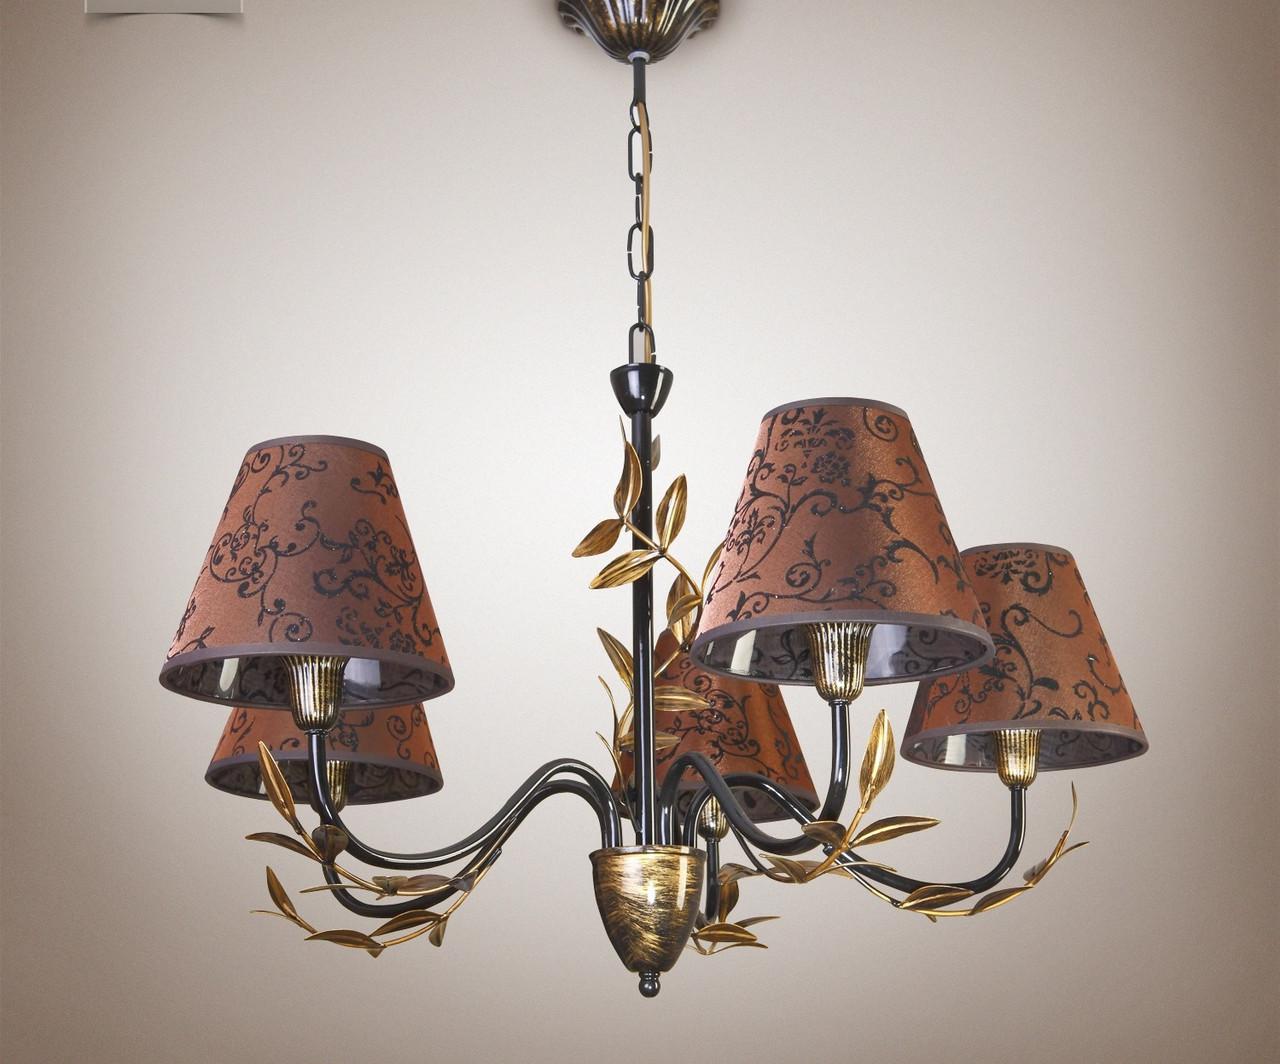 Люстра для зала, спальни 5-ти ламповая  11605-1